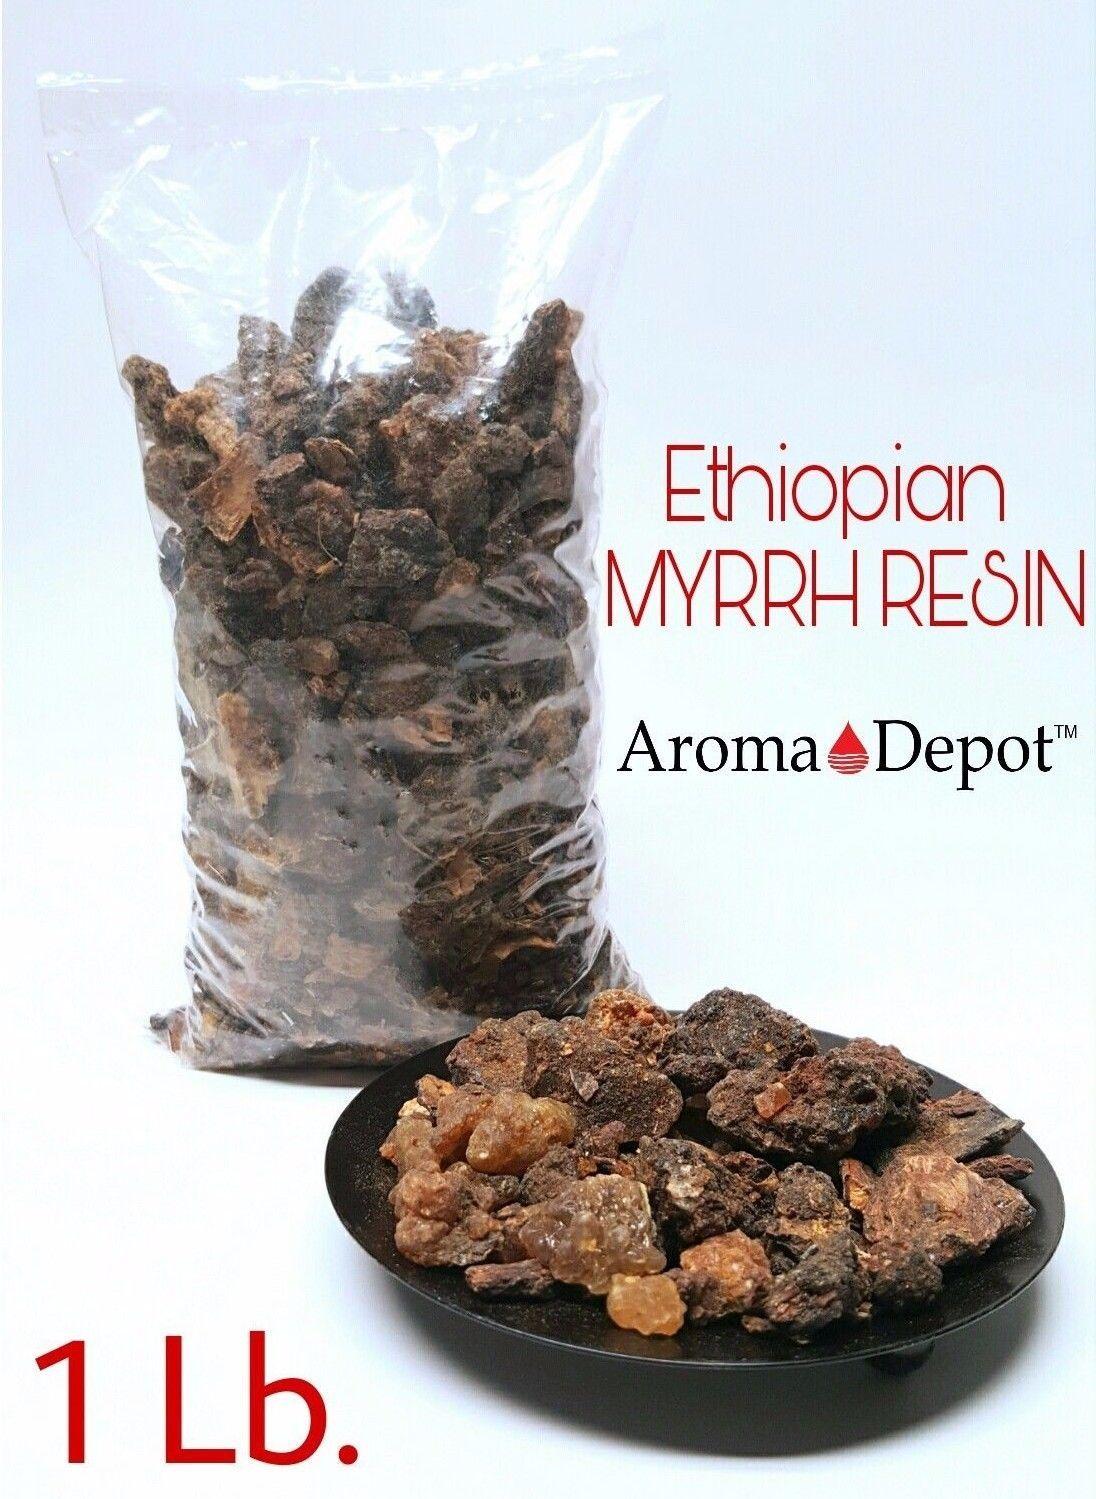 Ethiopian MYRRH Resin Tears Gum Sap Rock Incense Organic Aromatic Resin 1 lb.